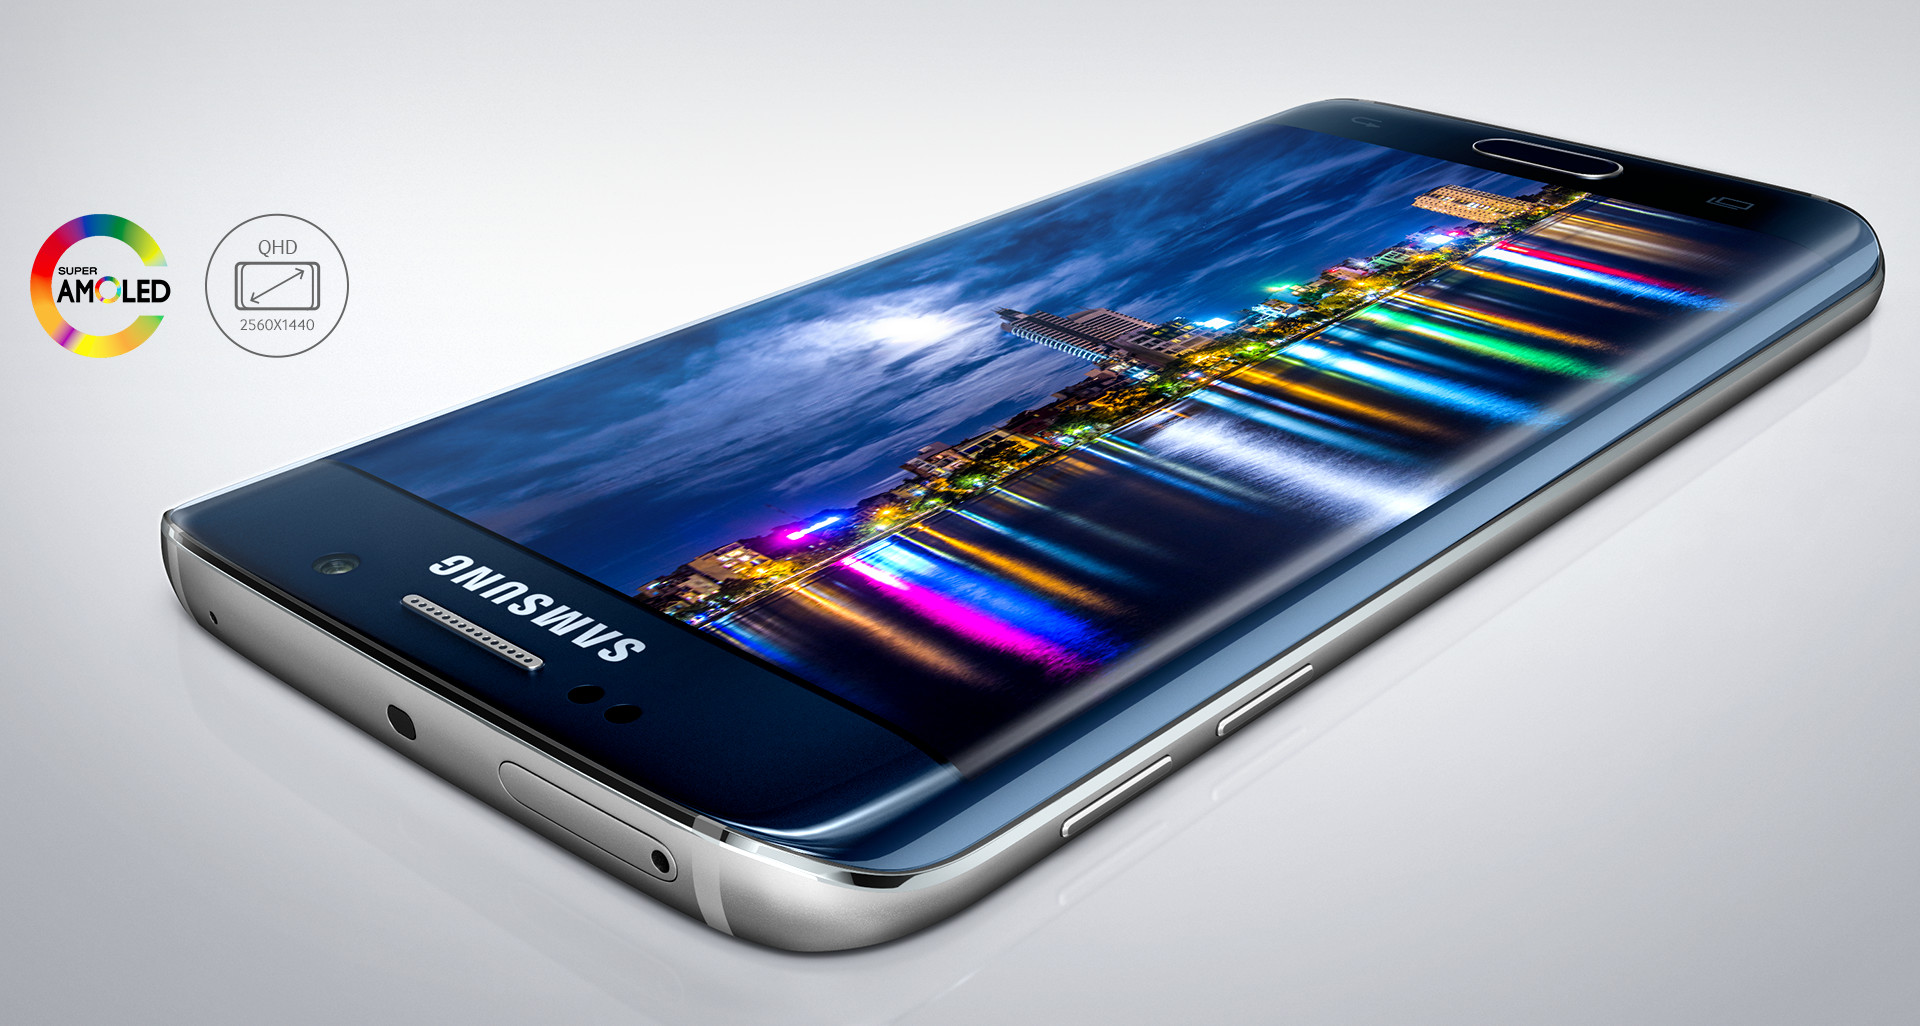 Samsung Galaxy S6 display